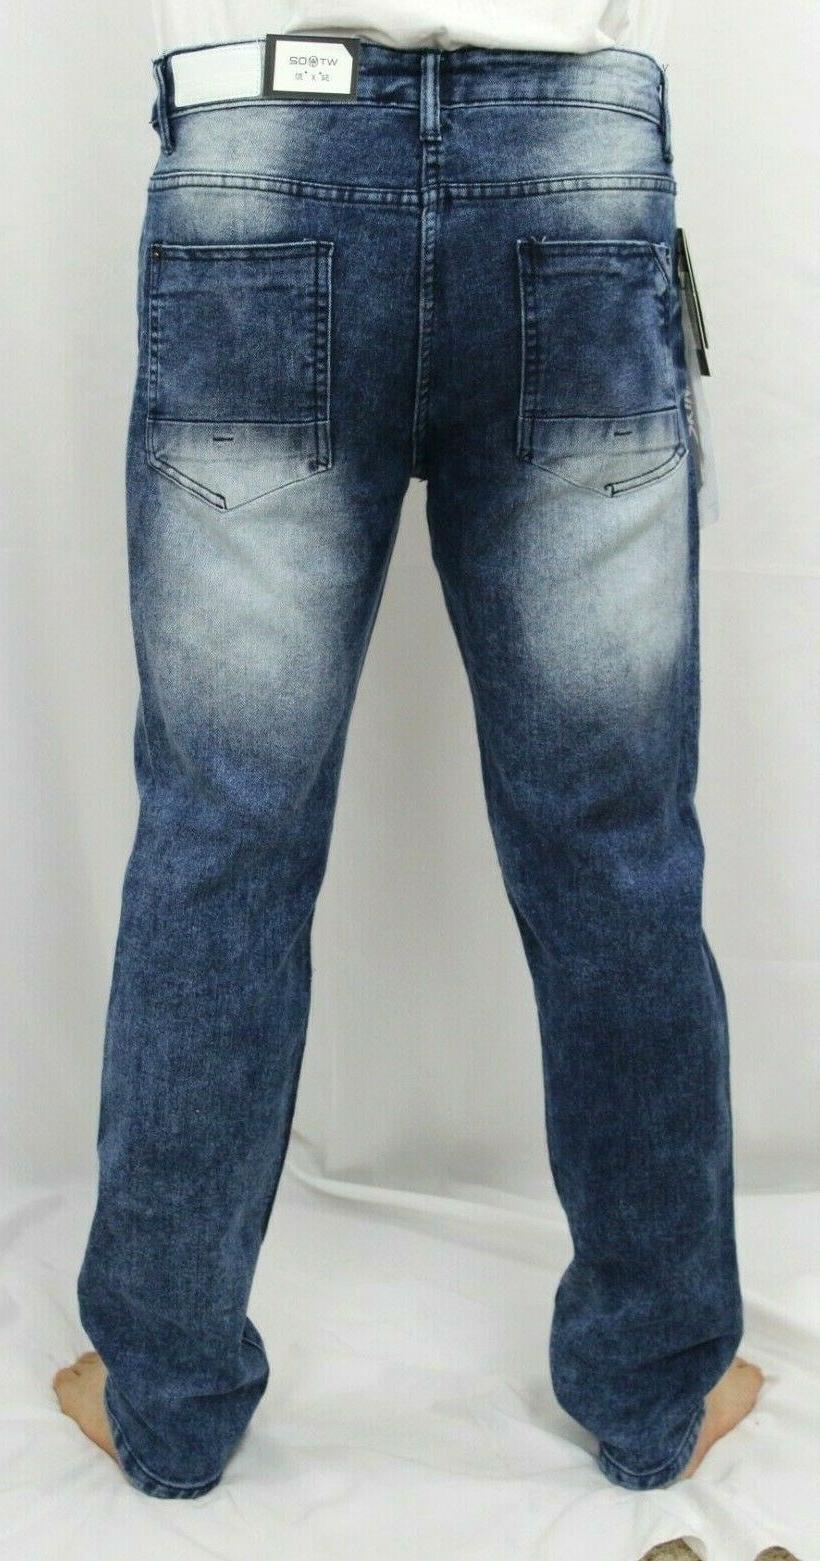 WT02 Men Skinny Jeans Ripped Stretch Denim Pants Distressed